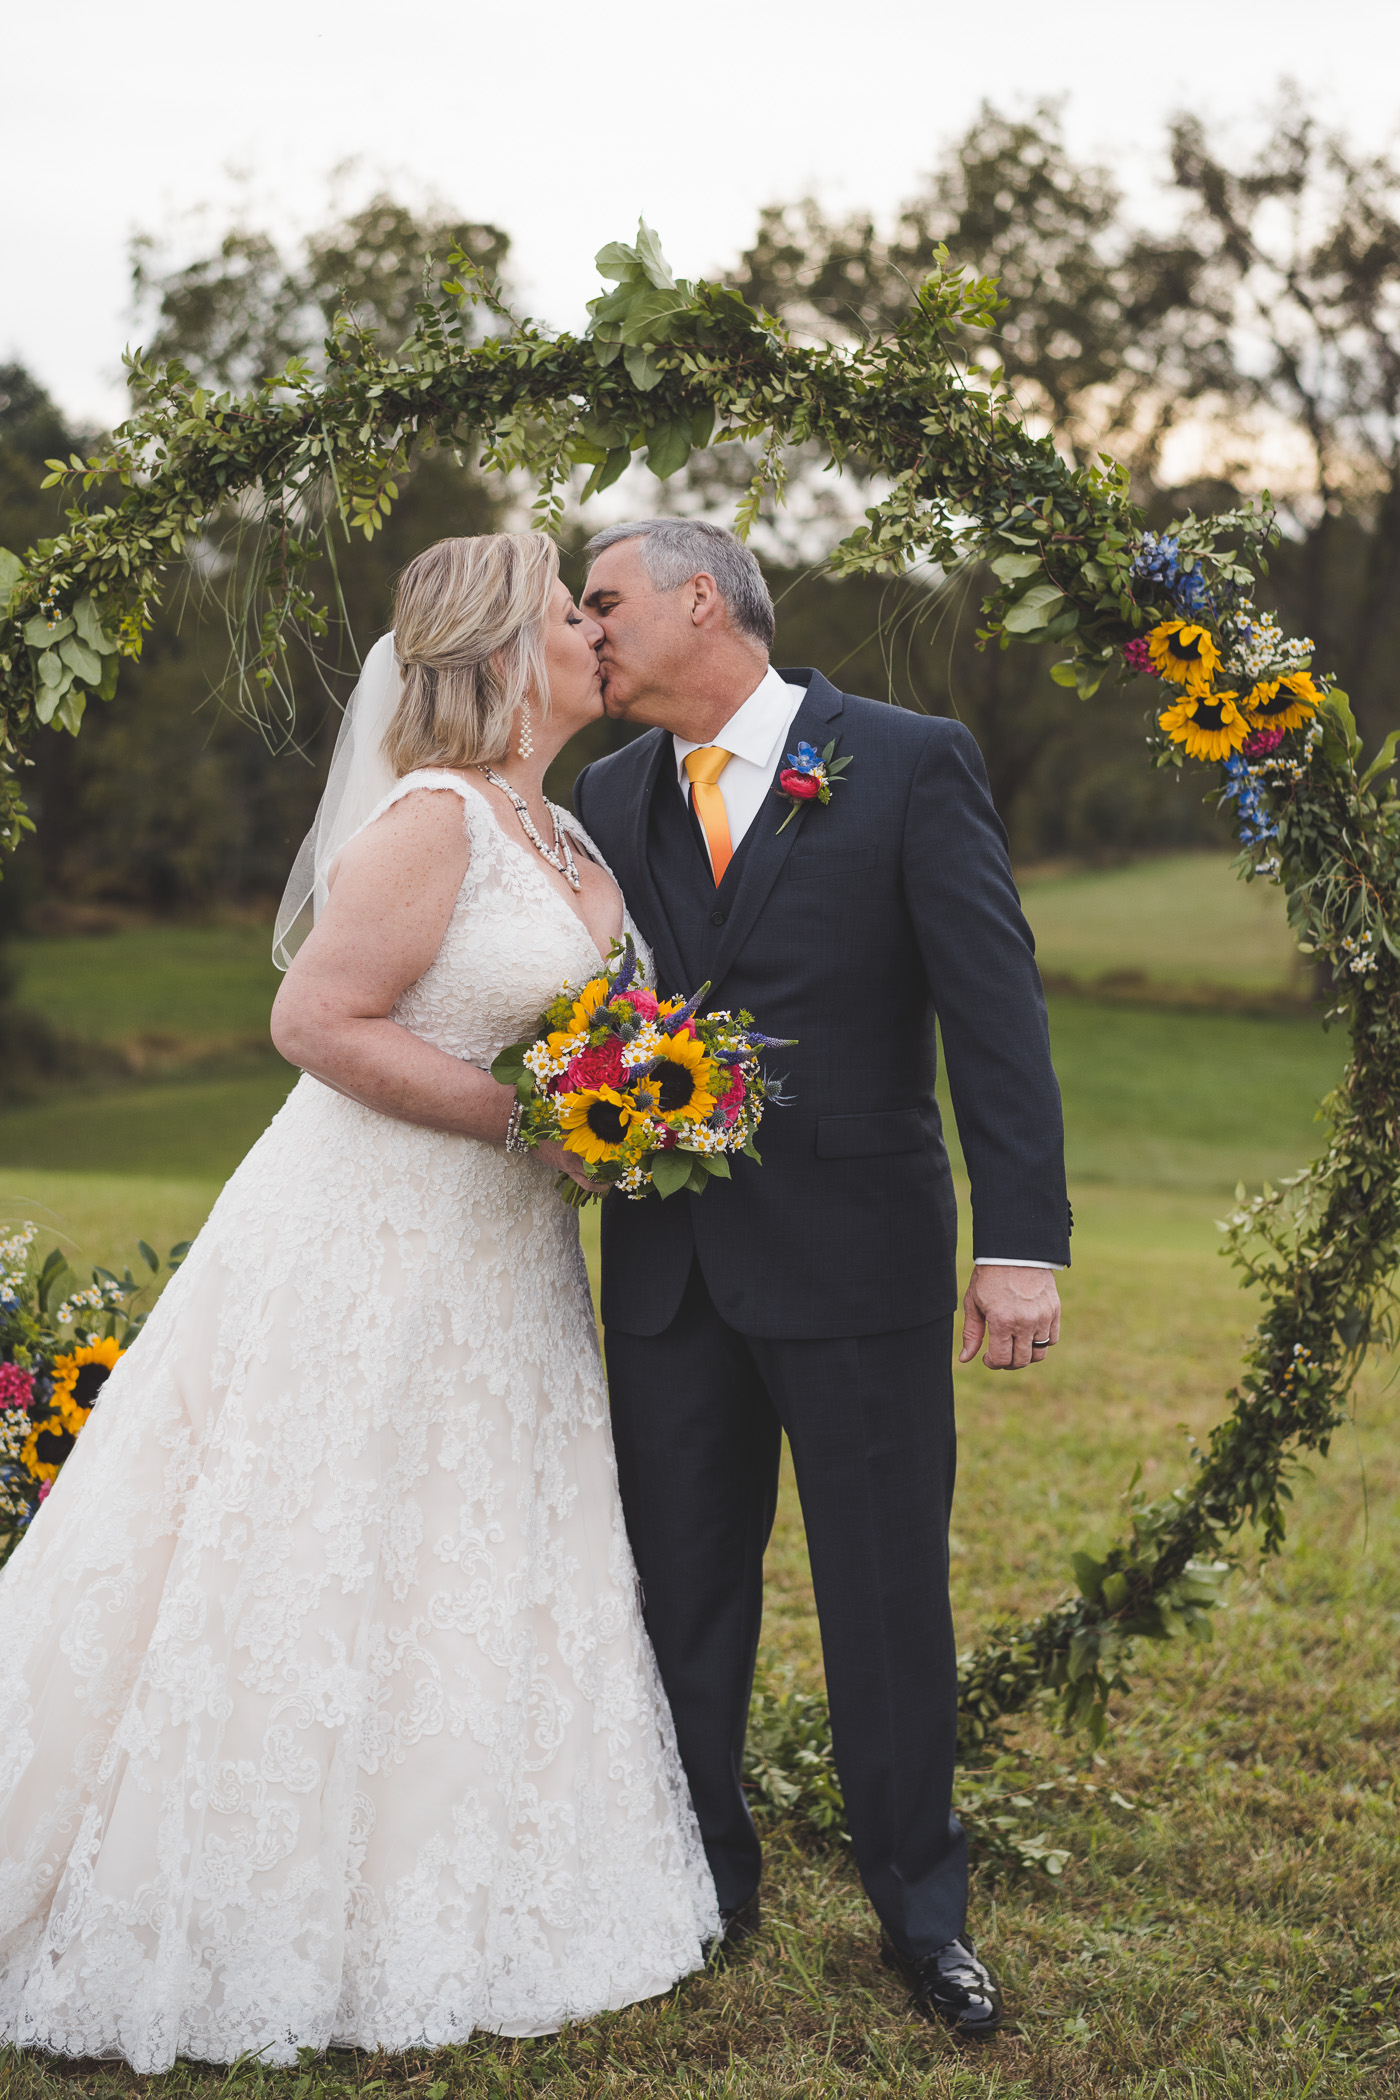 18-Faux Wedding-brandon shane warren-11.jpg